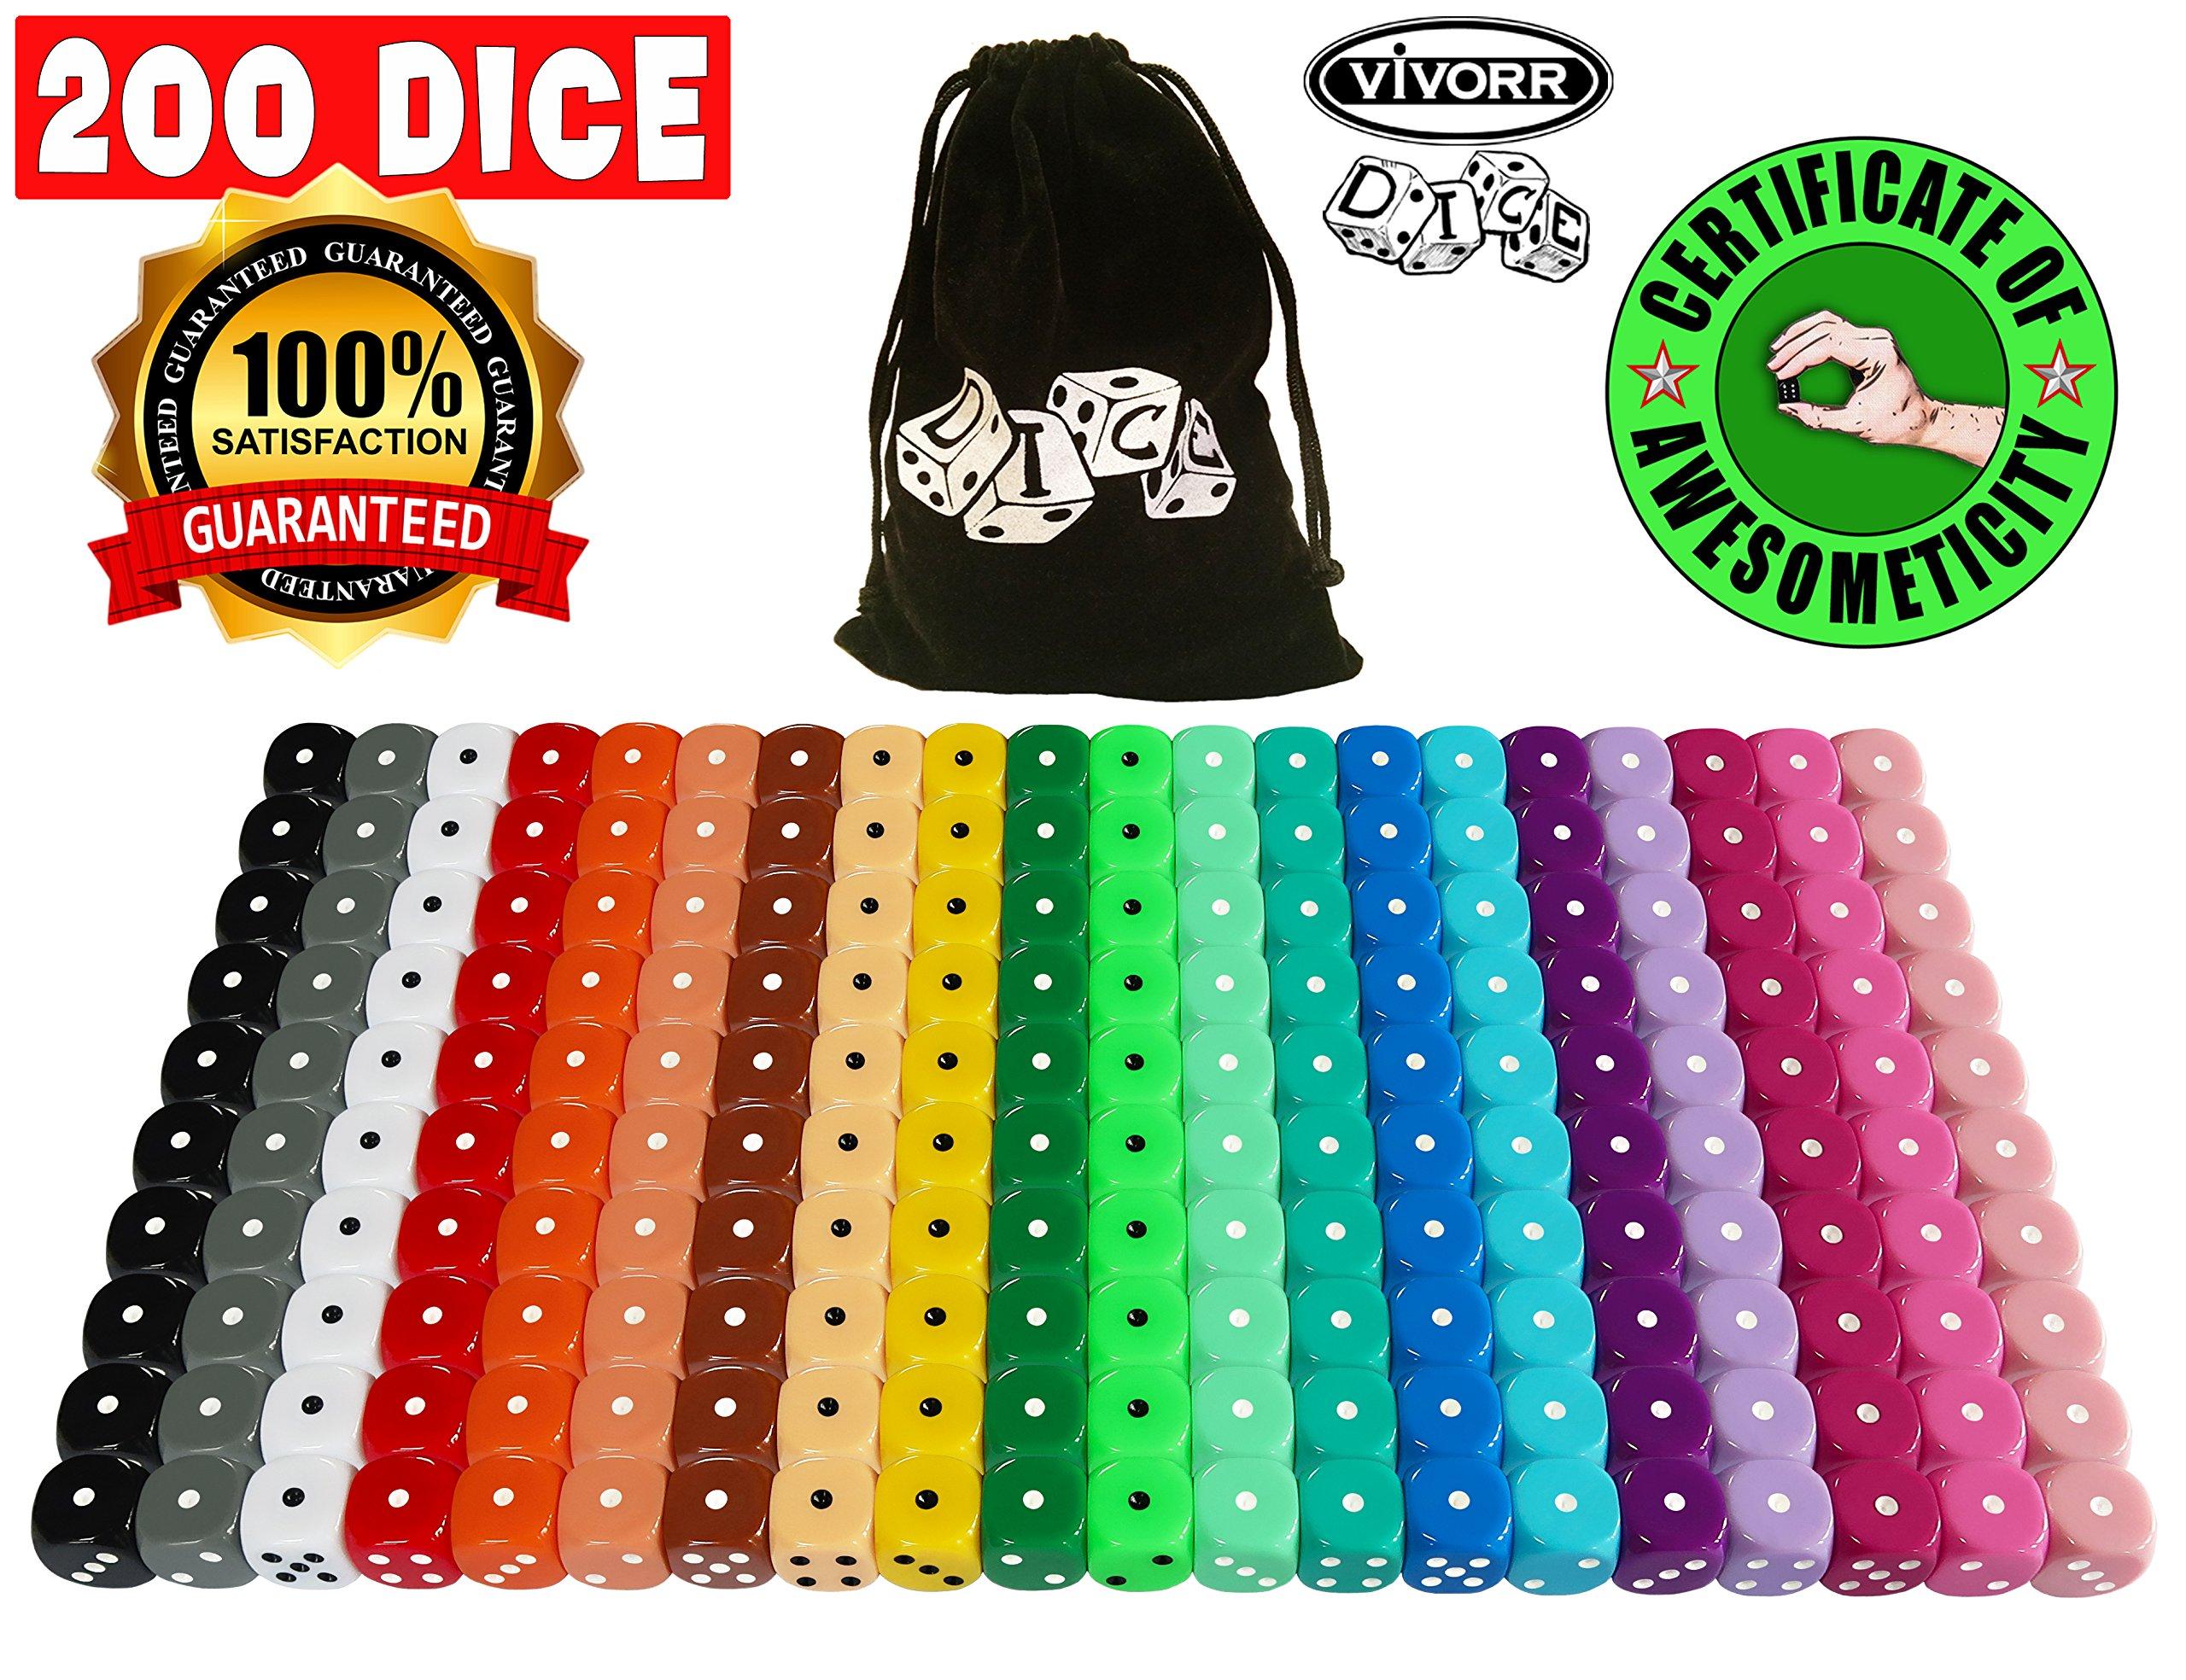 Vivorr Premium Dice Set of 200 Pieces, 20 Colors, 10 of Each Color, 16mm, D6, c/w Velvet Carry Bag / Pouch, Perfect for: Tenzi, Farkle, Yahtzee, Bunco, Board Games, Casino or Teaching Math. Ideal Gift